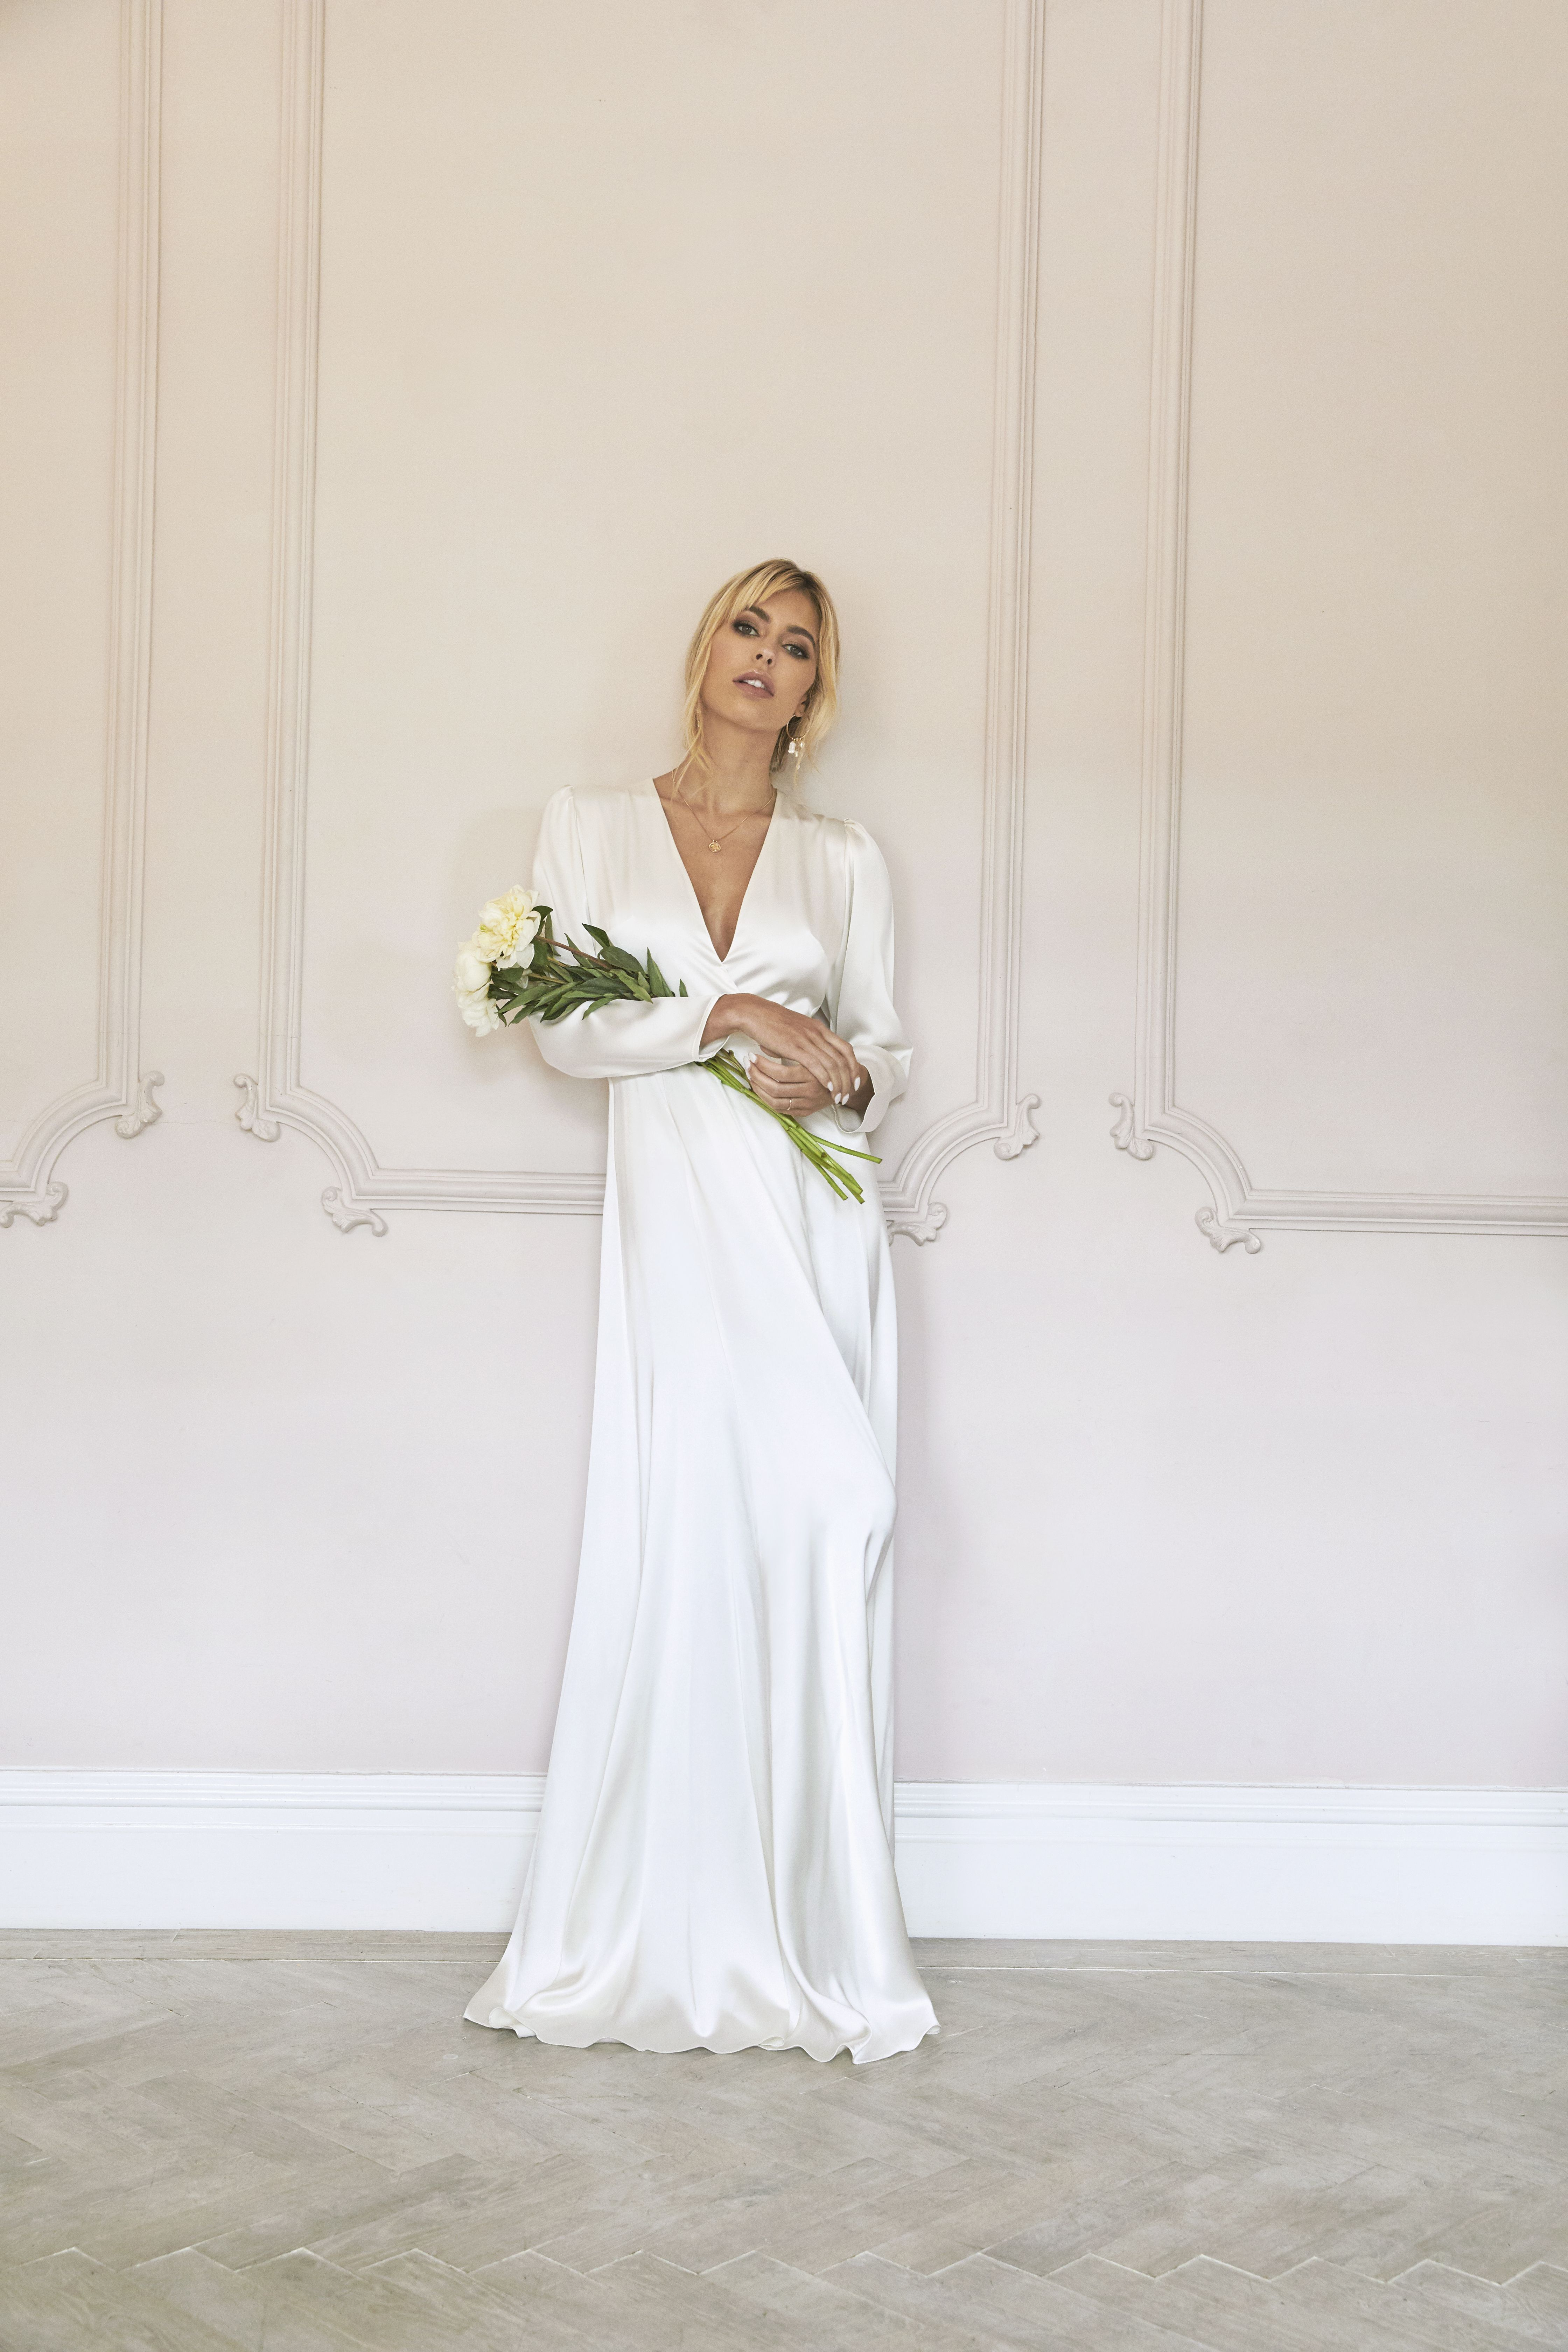 Olsen Wedding Dress Long Sleeve Sheer Wedding Dress Wedding Dresses [ 6720 x 4480 Pixel ]